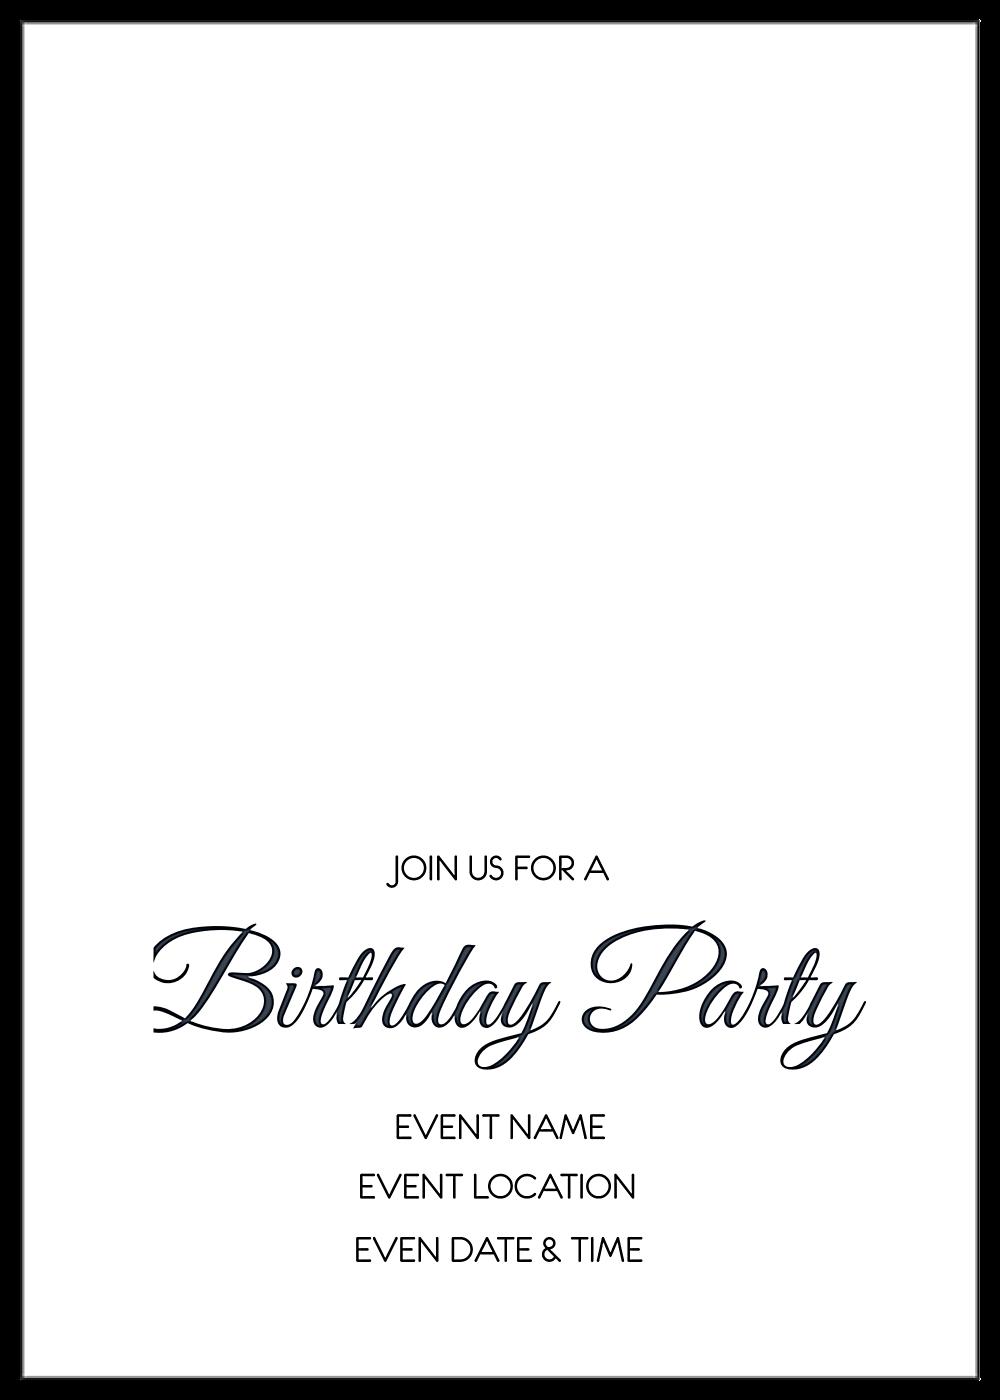 Fun Birthday back - Greeting Cards Maker